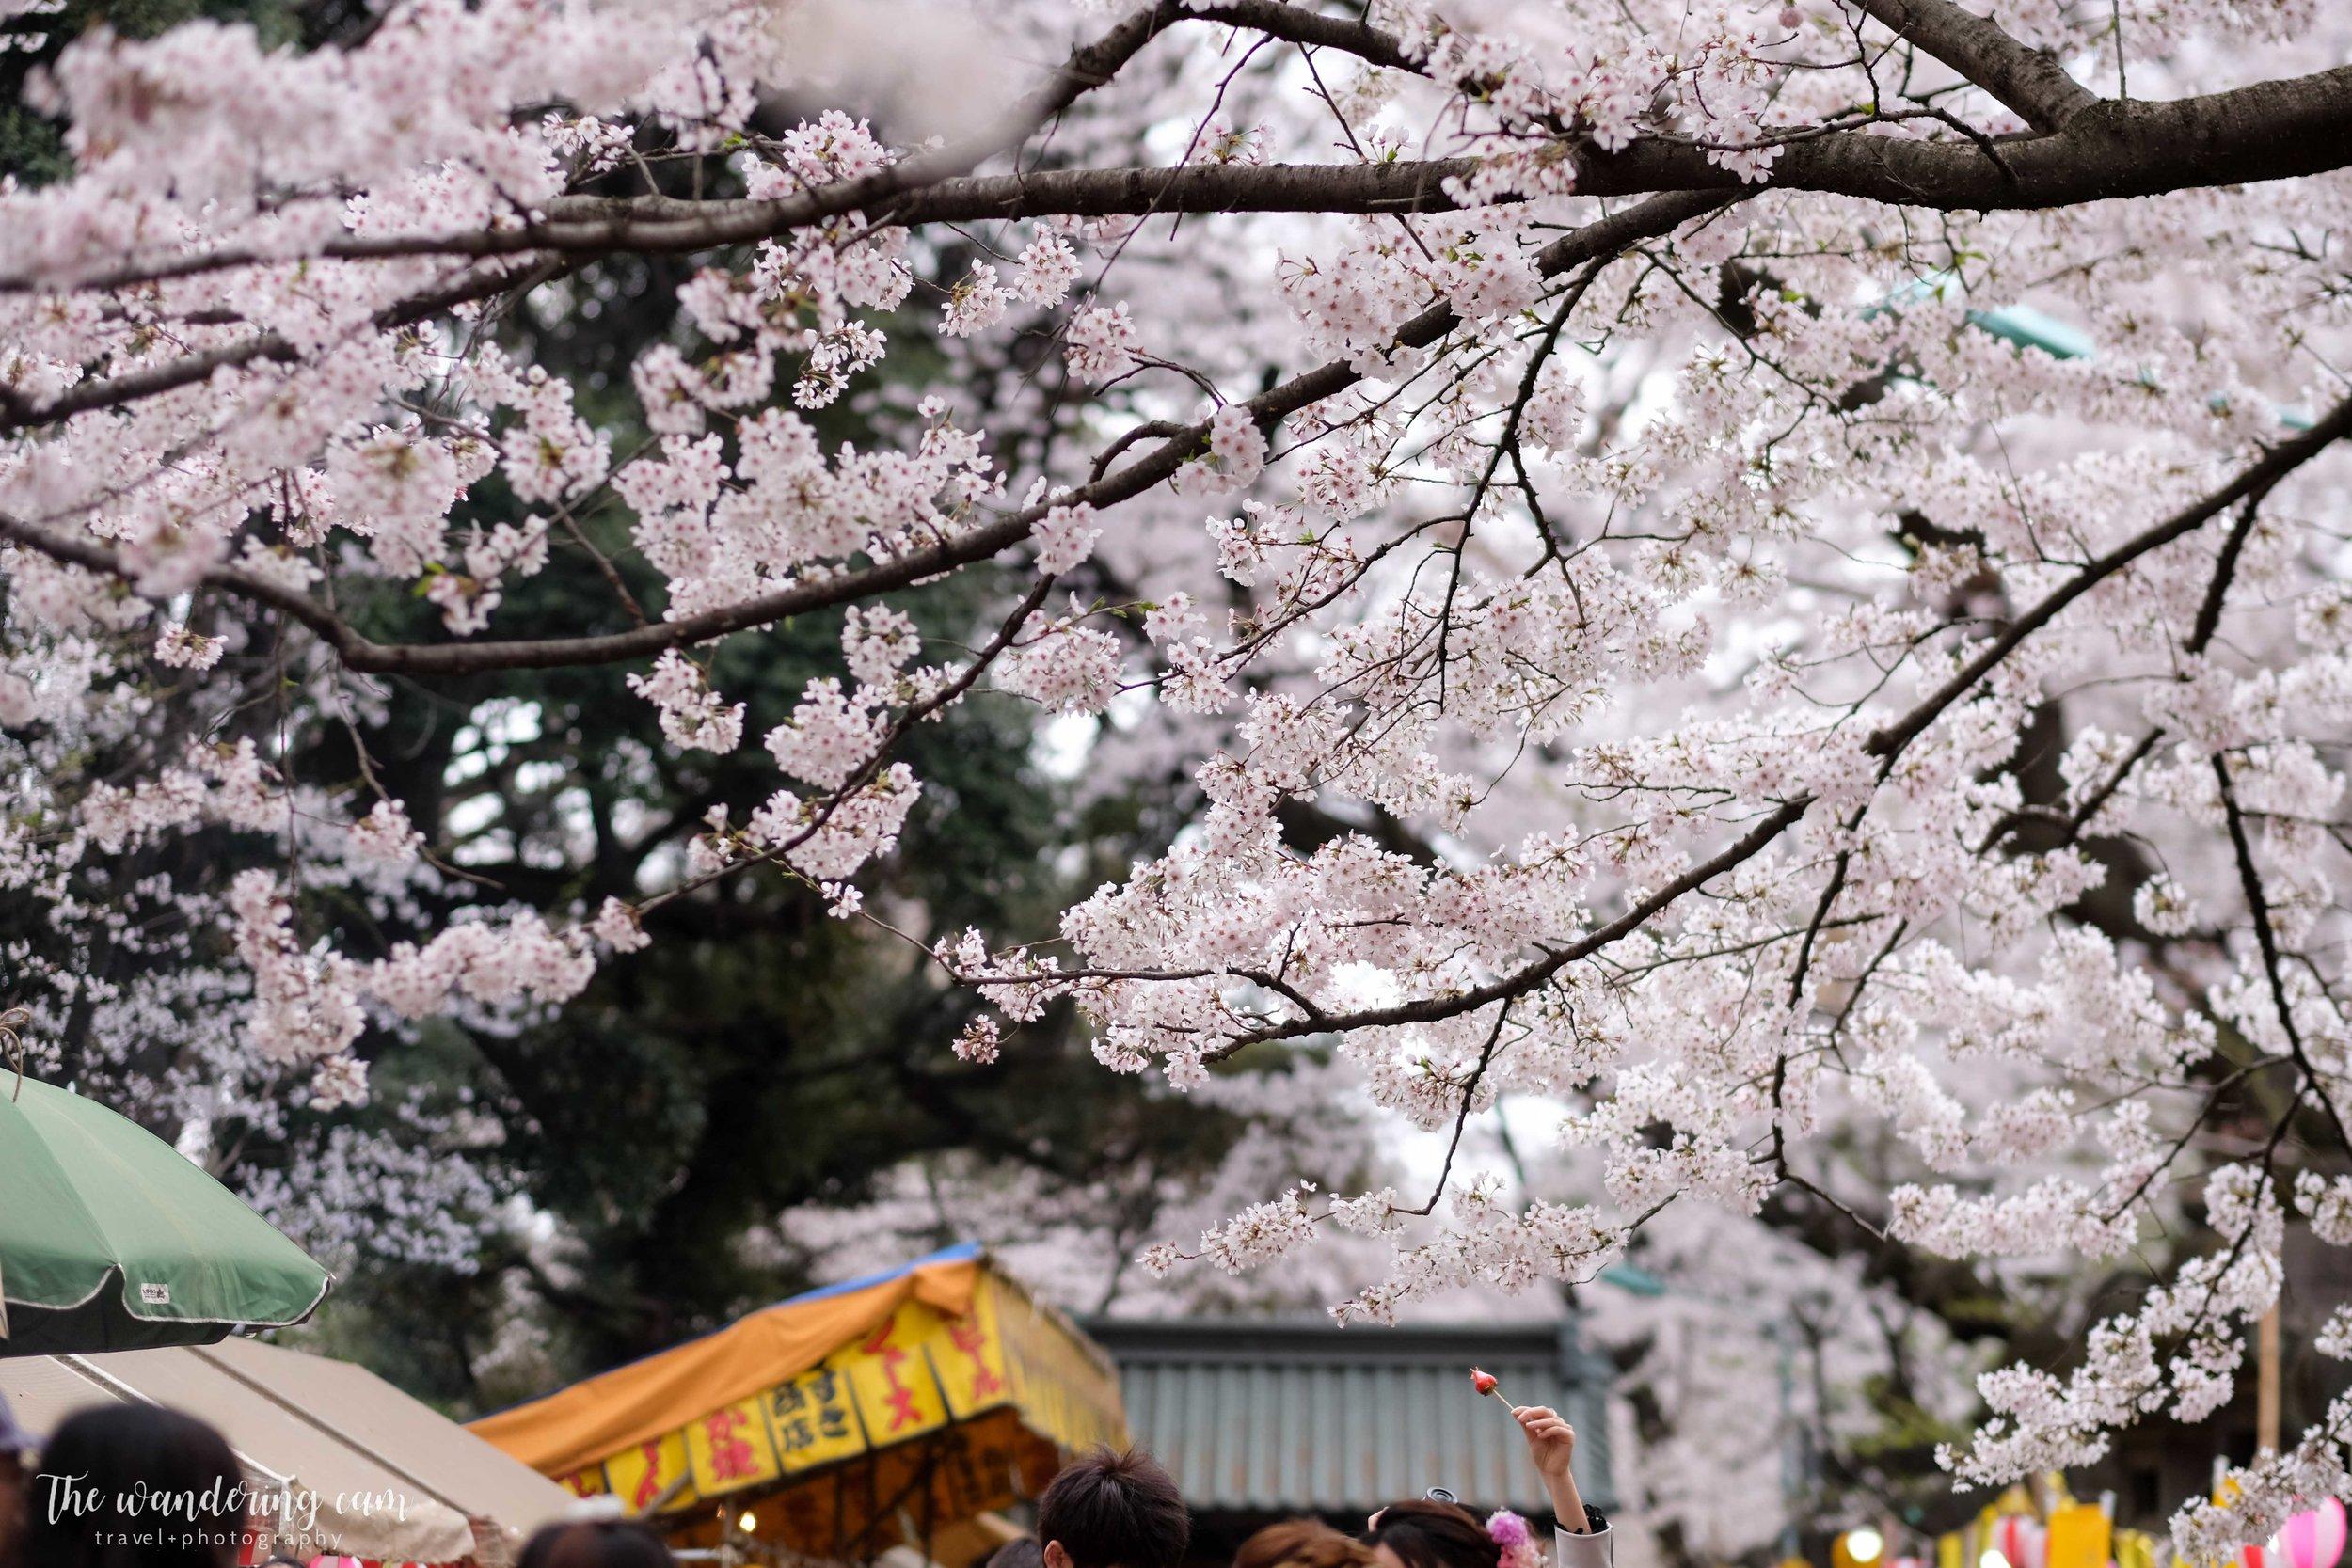 thewanderingcam_sakura_uenopark-4889.jpg